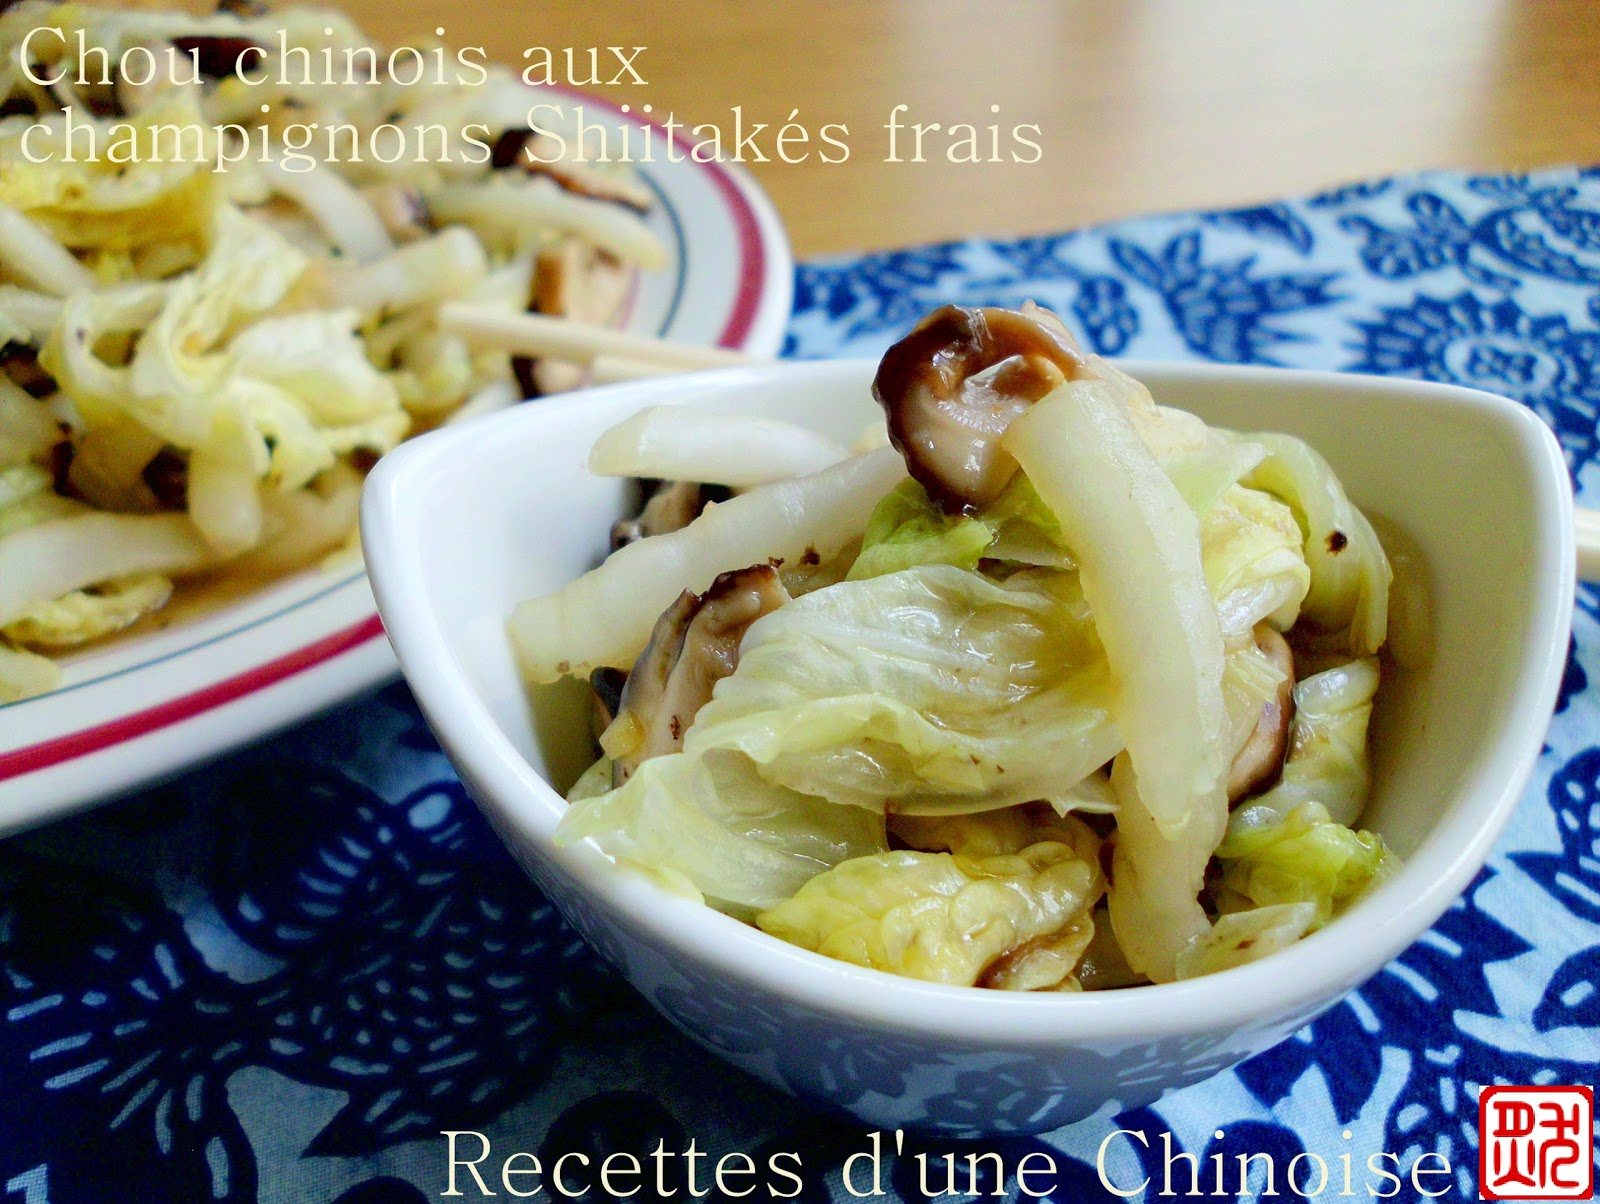 Recettes d 39 une chinoise chou chinois pe tsa aux champignons shiitak s frais xi ng g b ic i - Un chinois en cuisine ...